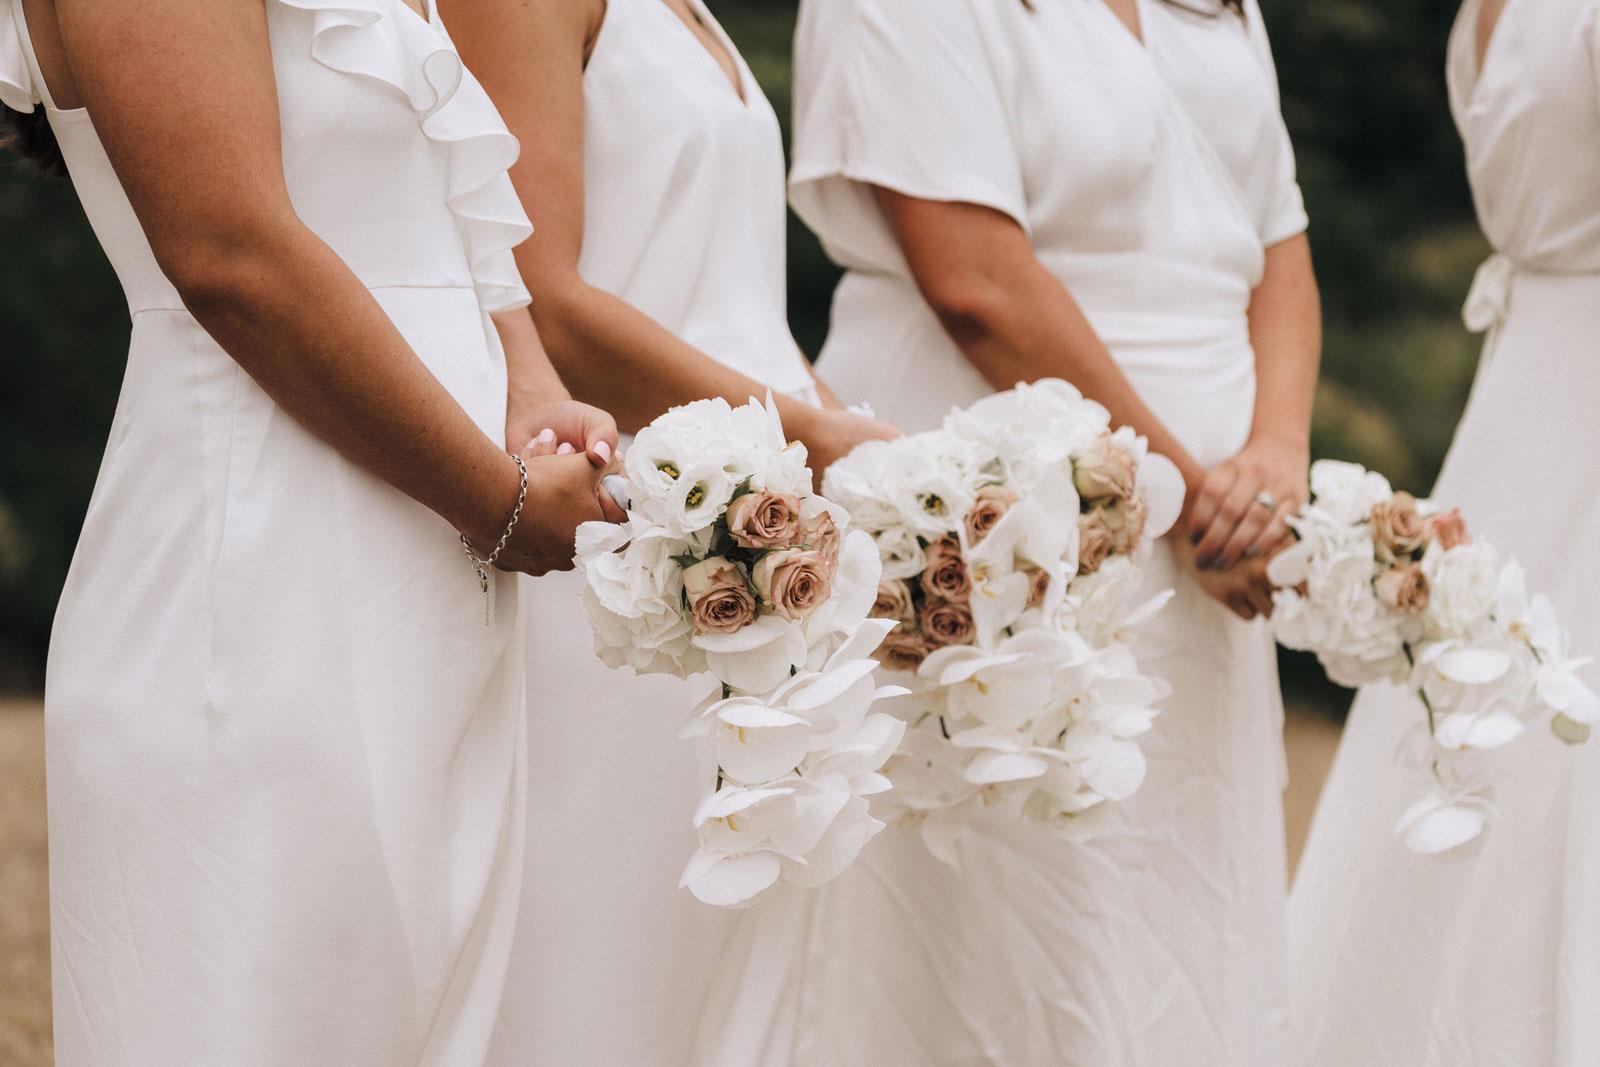 newfound-s-t-hunua-auckland-wedding-photographers-039